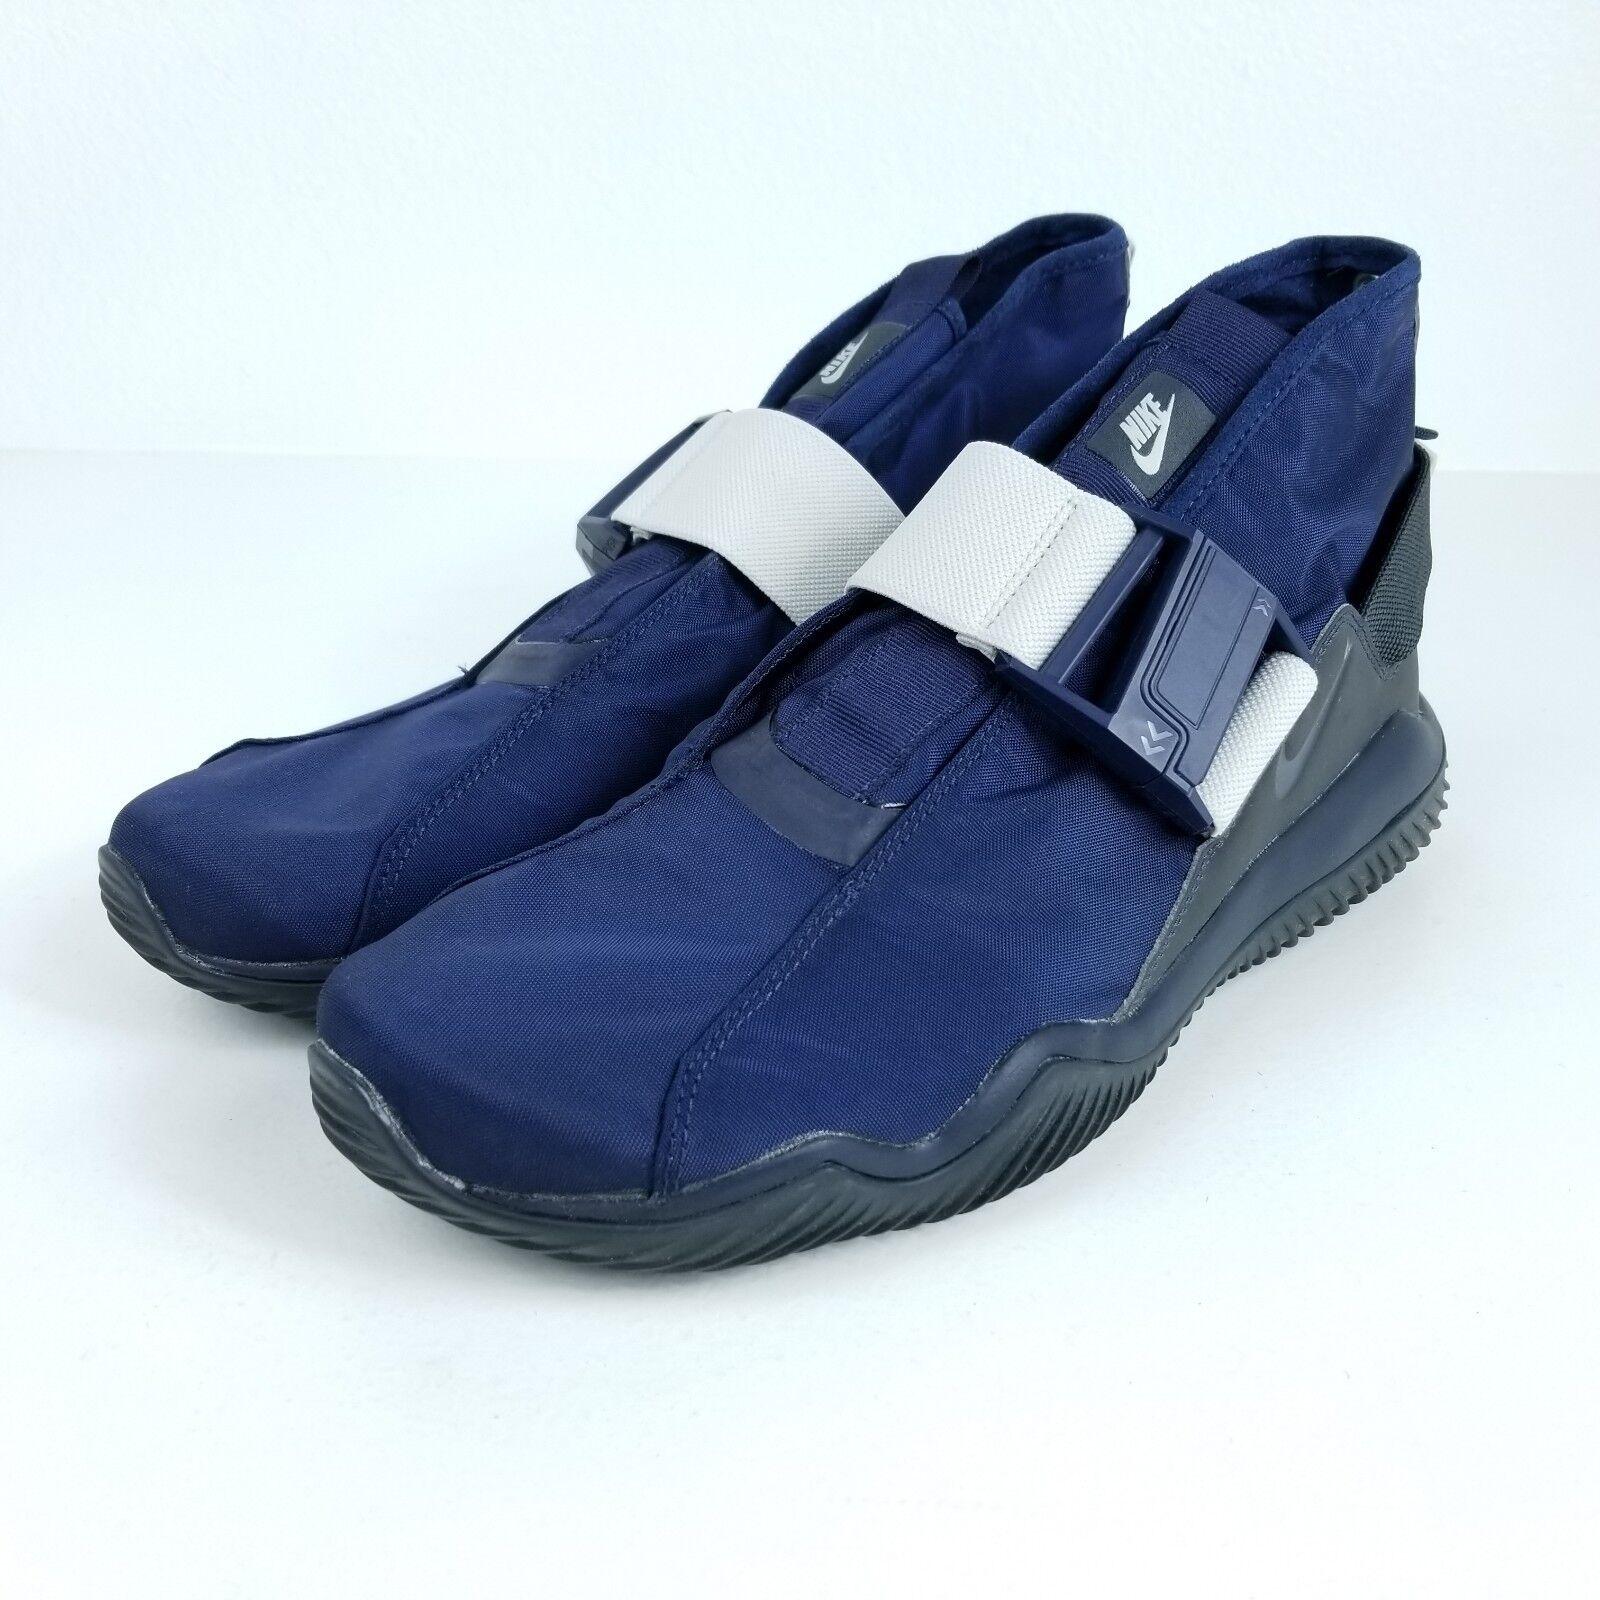 Nike kmtr komyuter se acg Uomo sz scarpe blu e nero aa0531 400